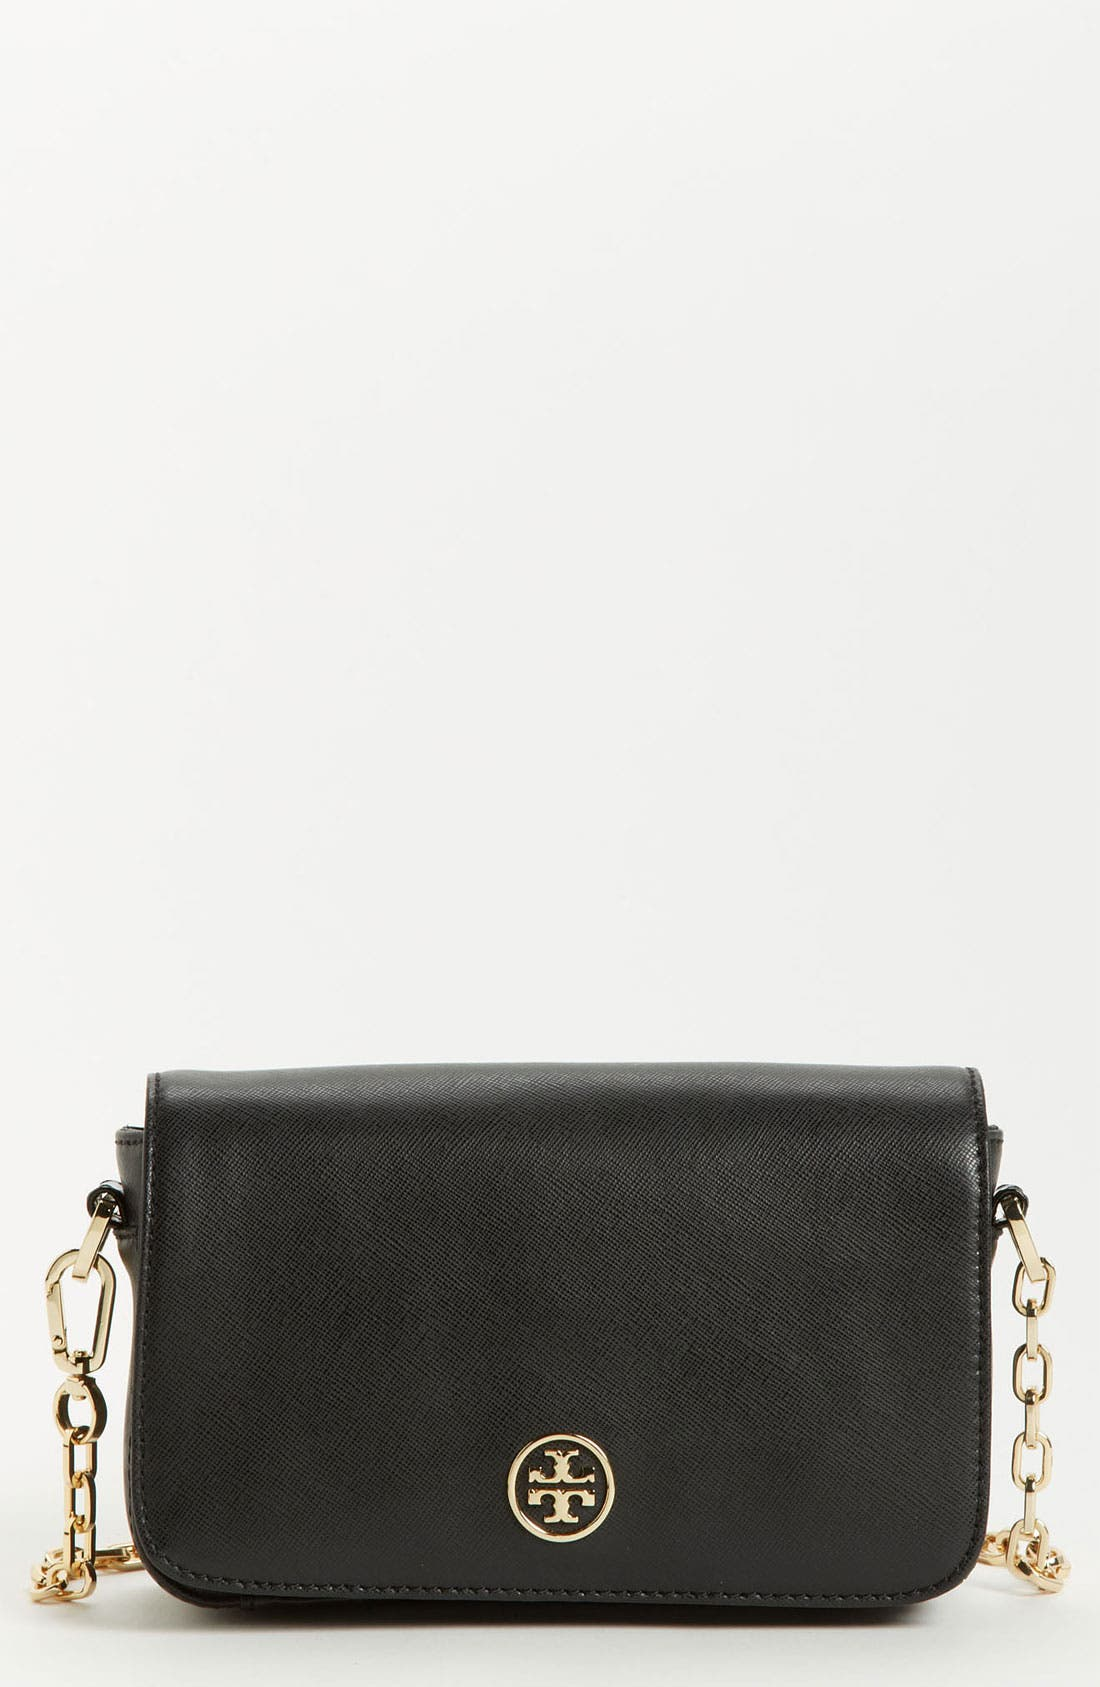 Main Image - Tory Burch 'Robinson - Mini' Saffiano Leather Crossbody Bag